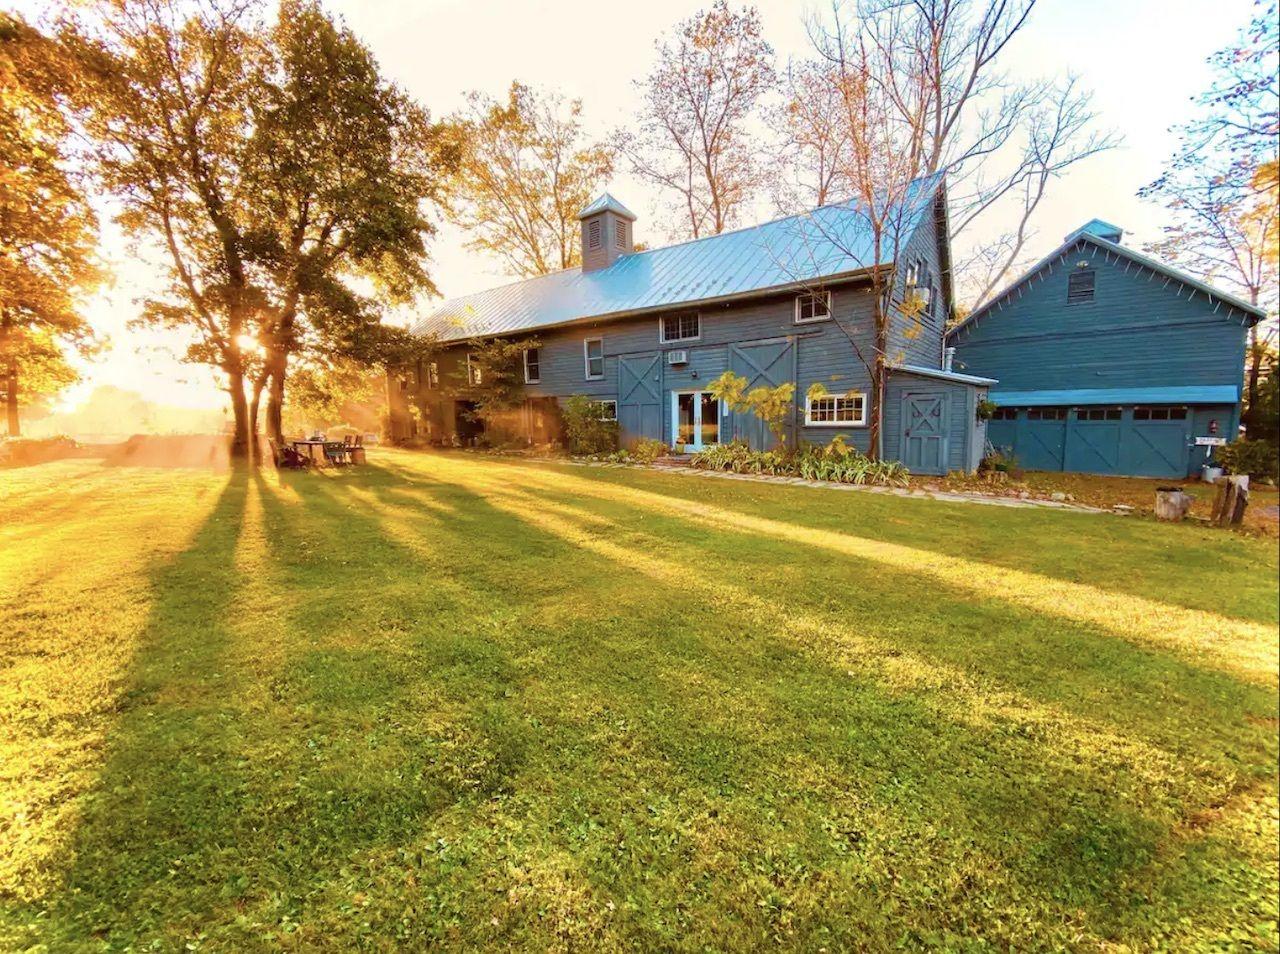 warwick barnhouse, most wish-listed barns